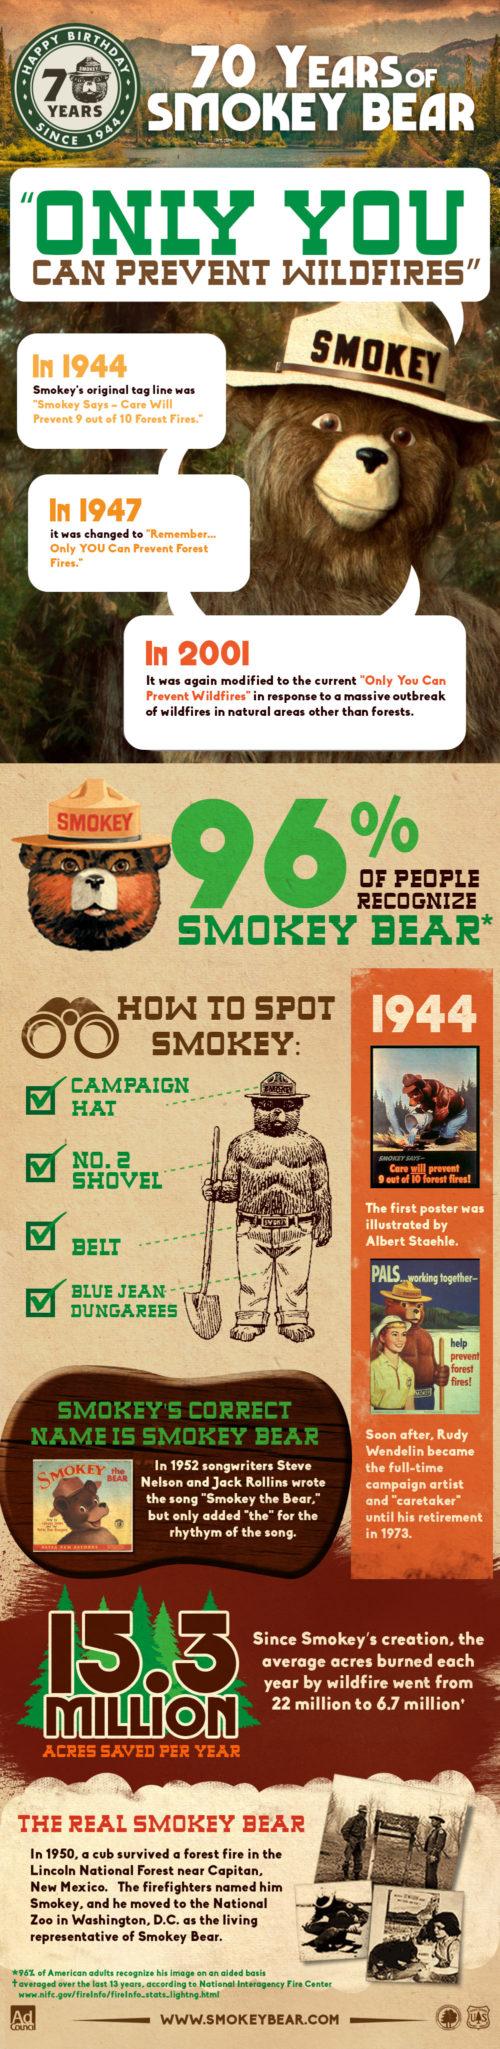 Smokey Bear infographic